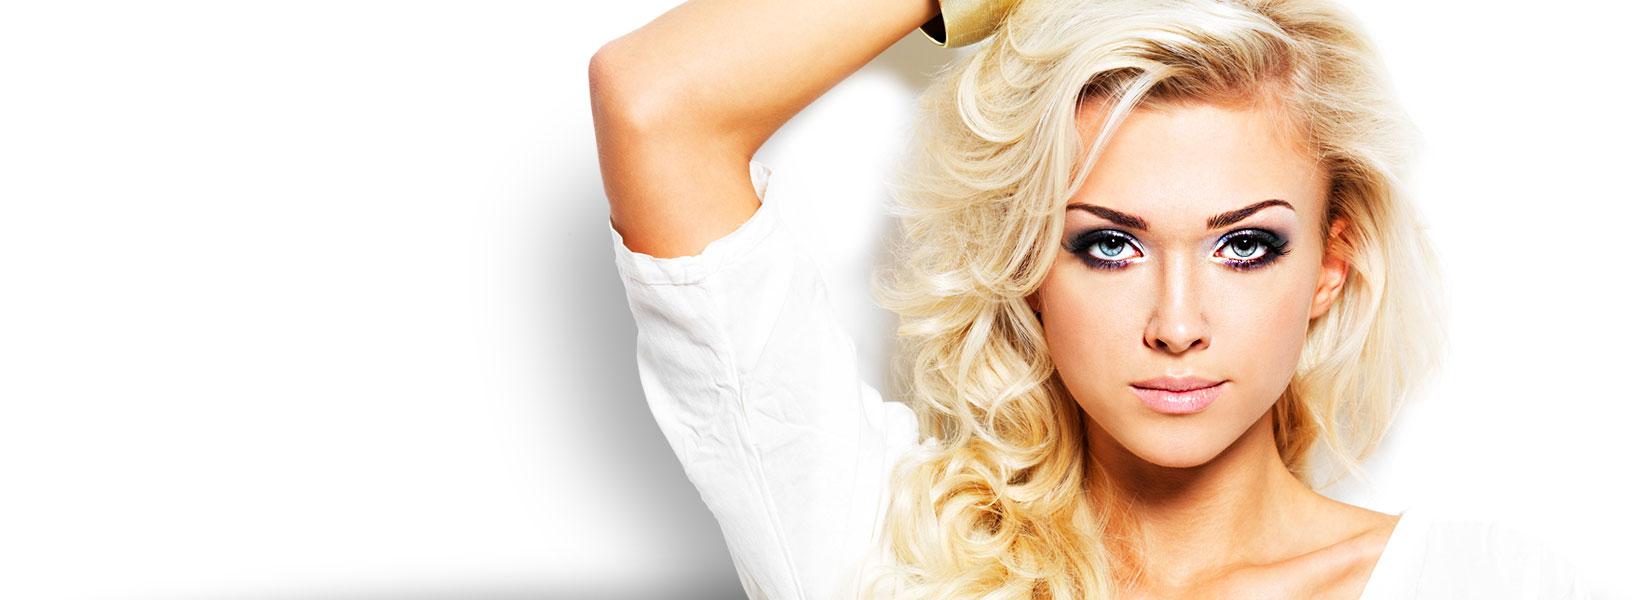 parrucchieri-milano-hair-stylist-centro-estetico